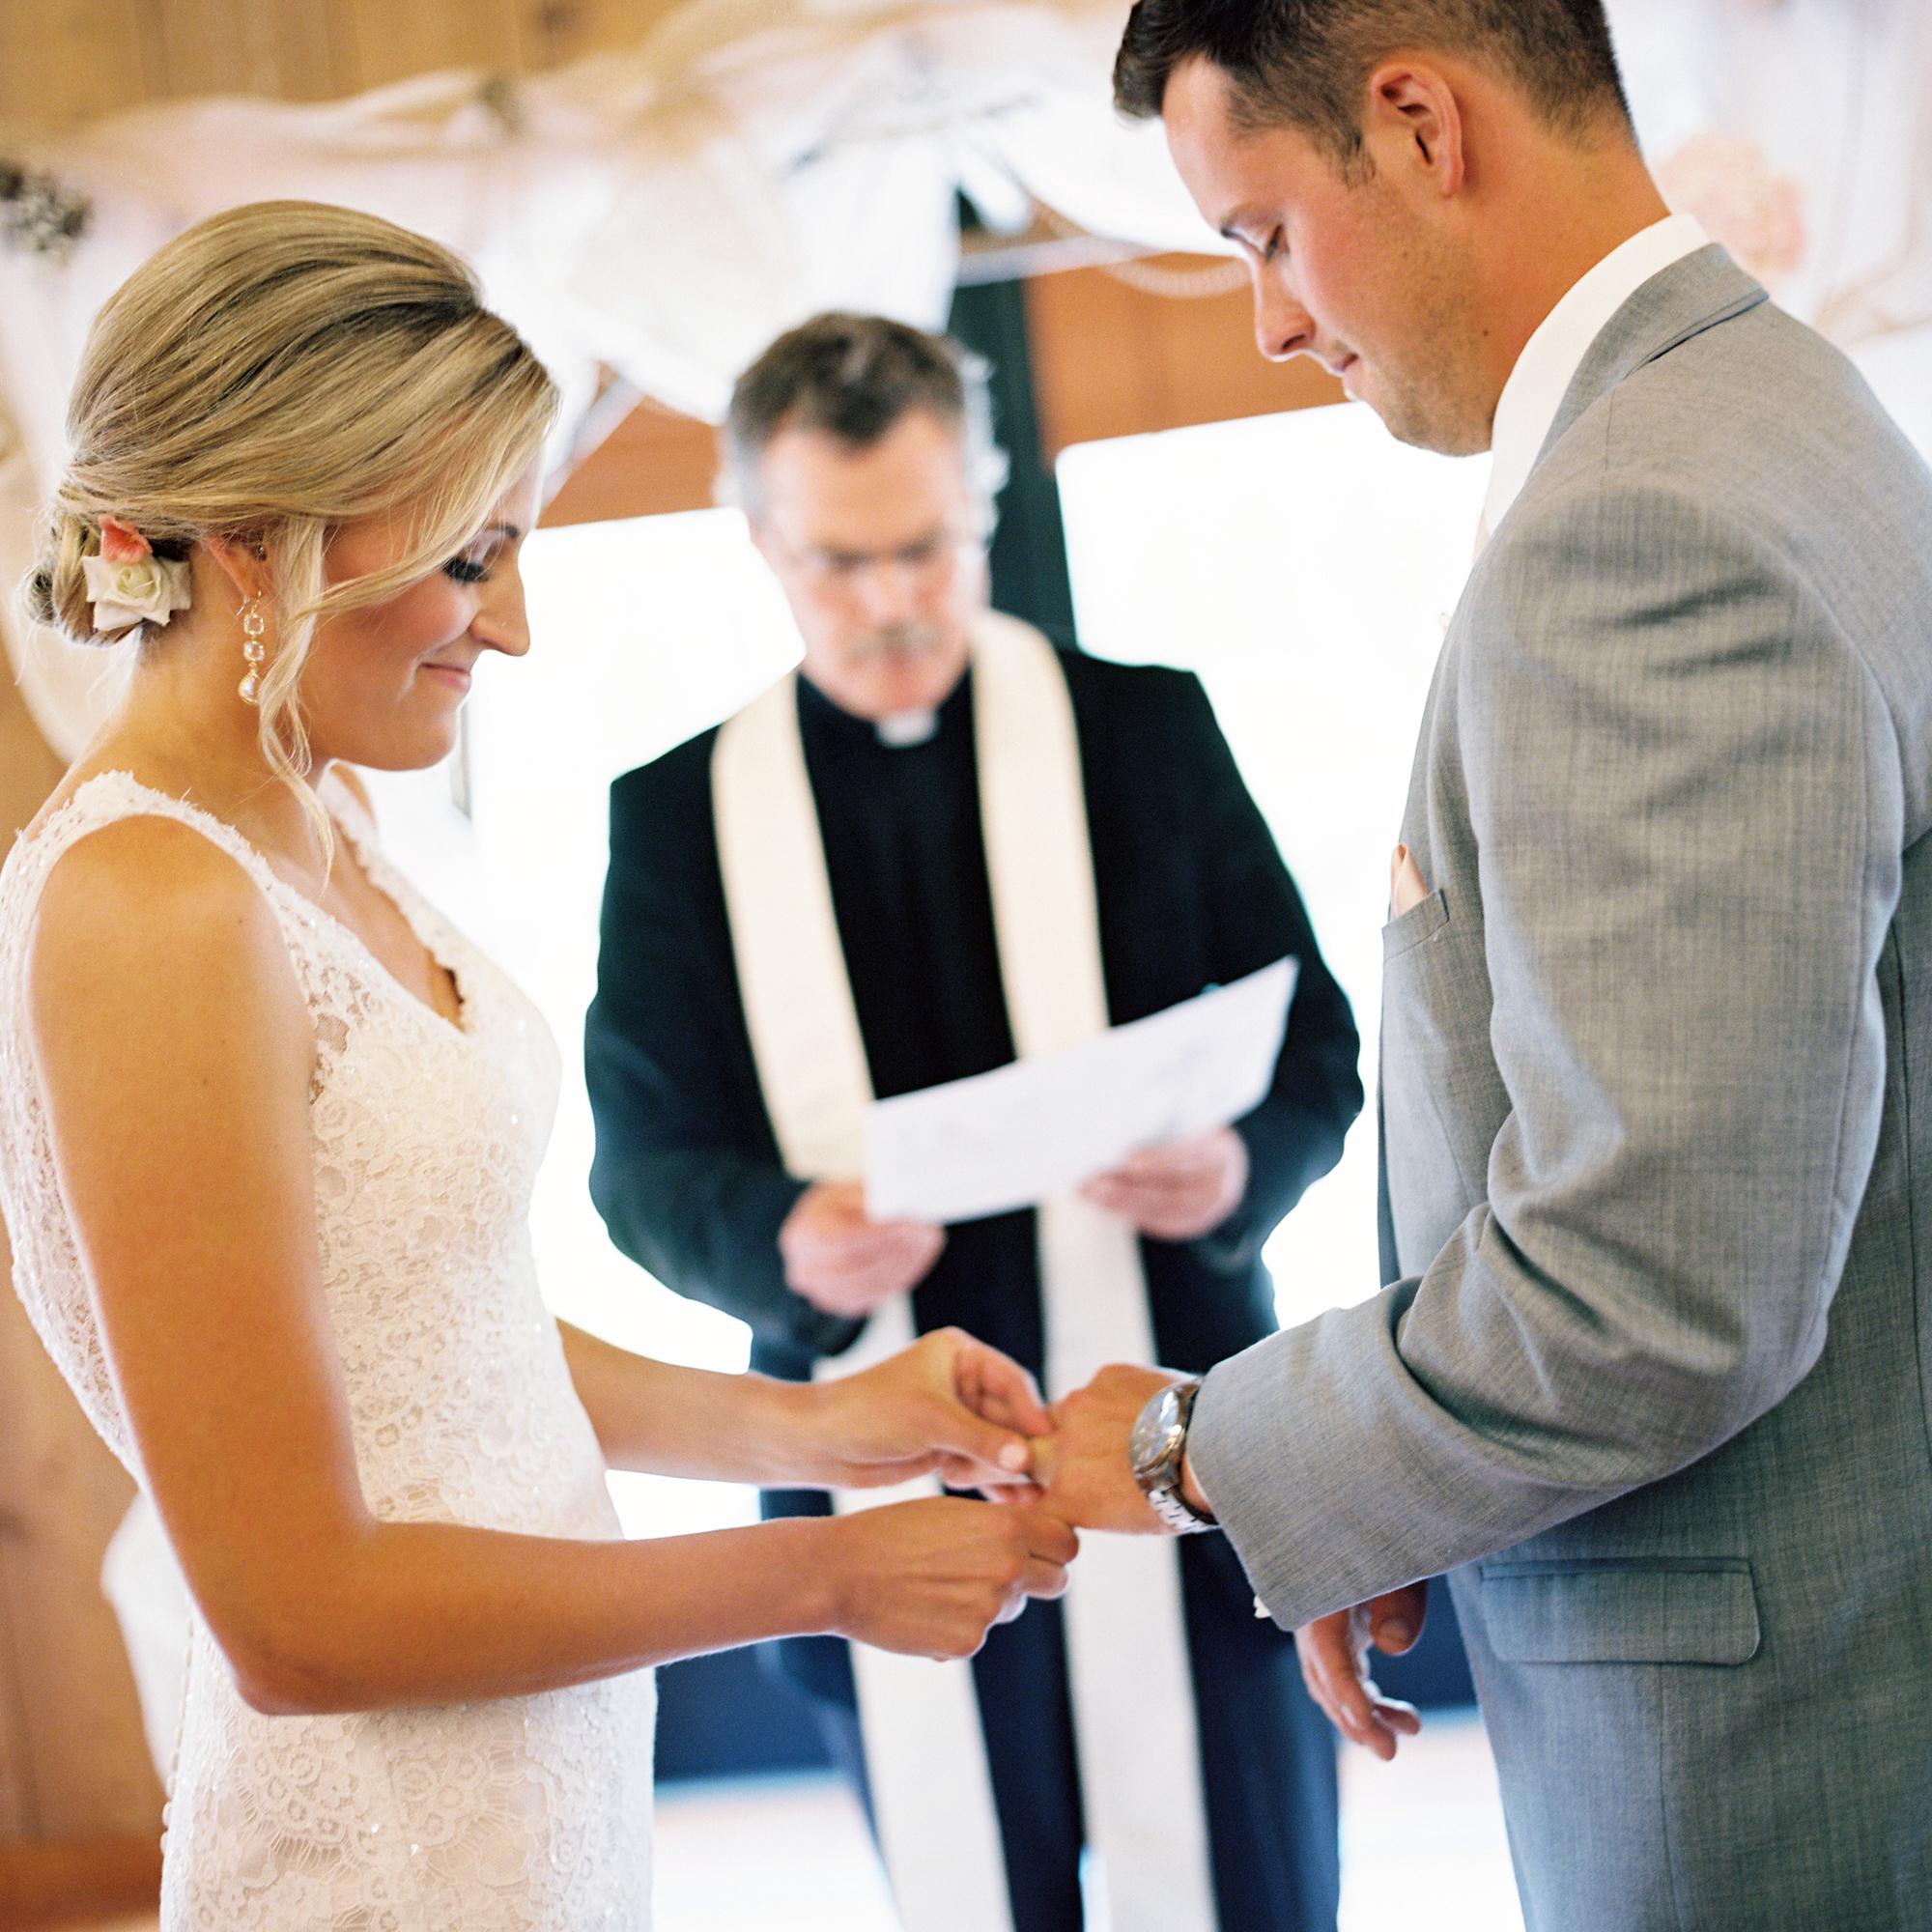 Bride putting on grooms wedding ring